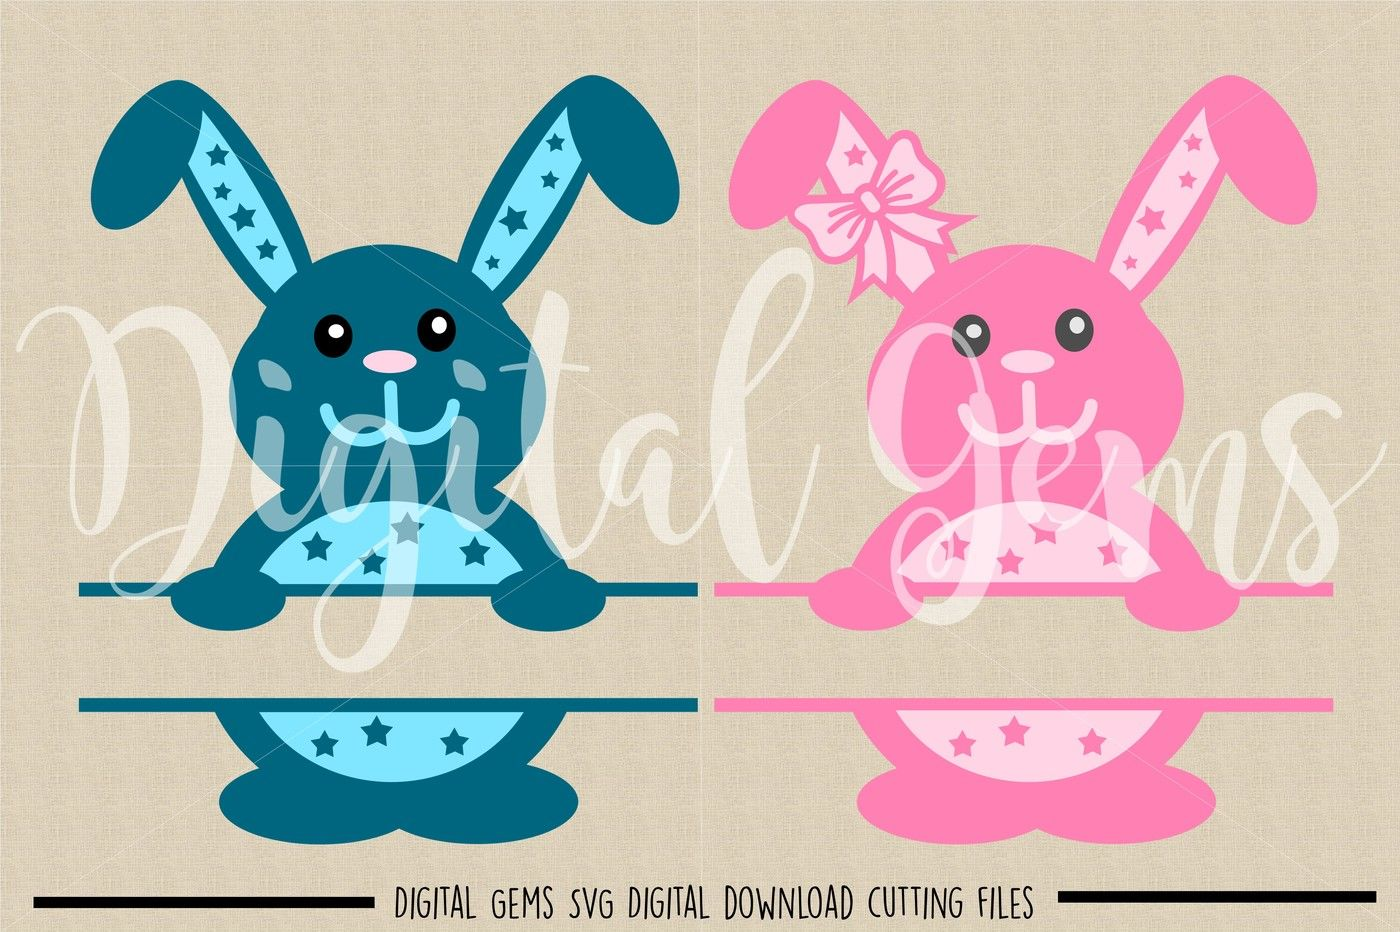 Split Easter Bunny Svg Dxf Eps Png Files By Digital Gems Thehungryjpeg Com